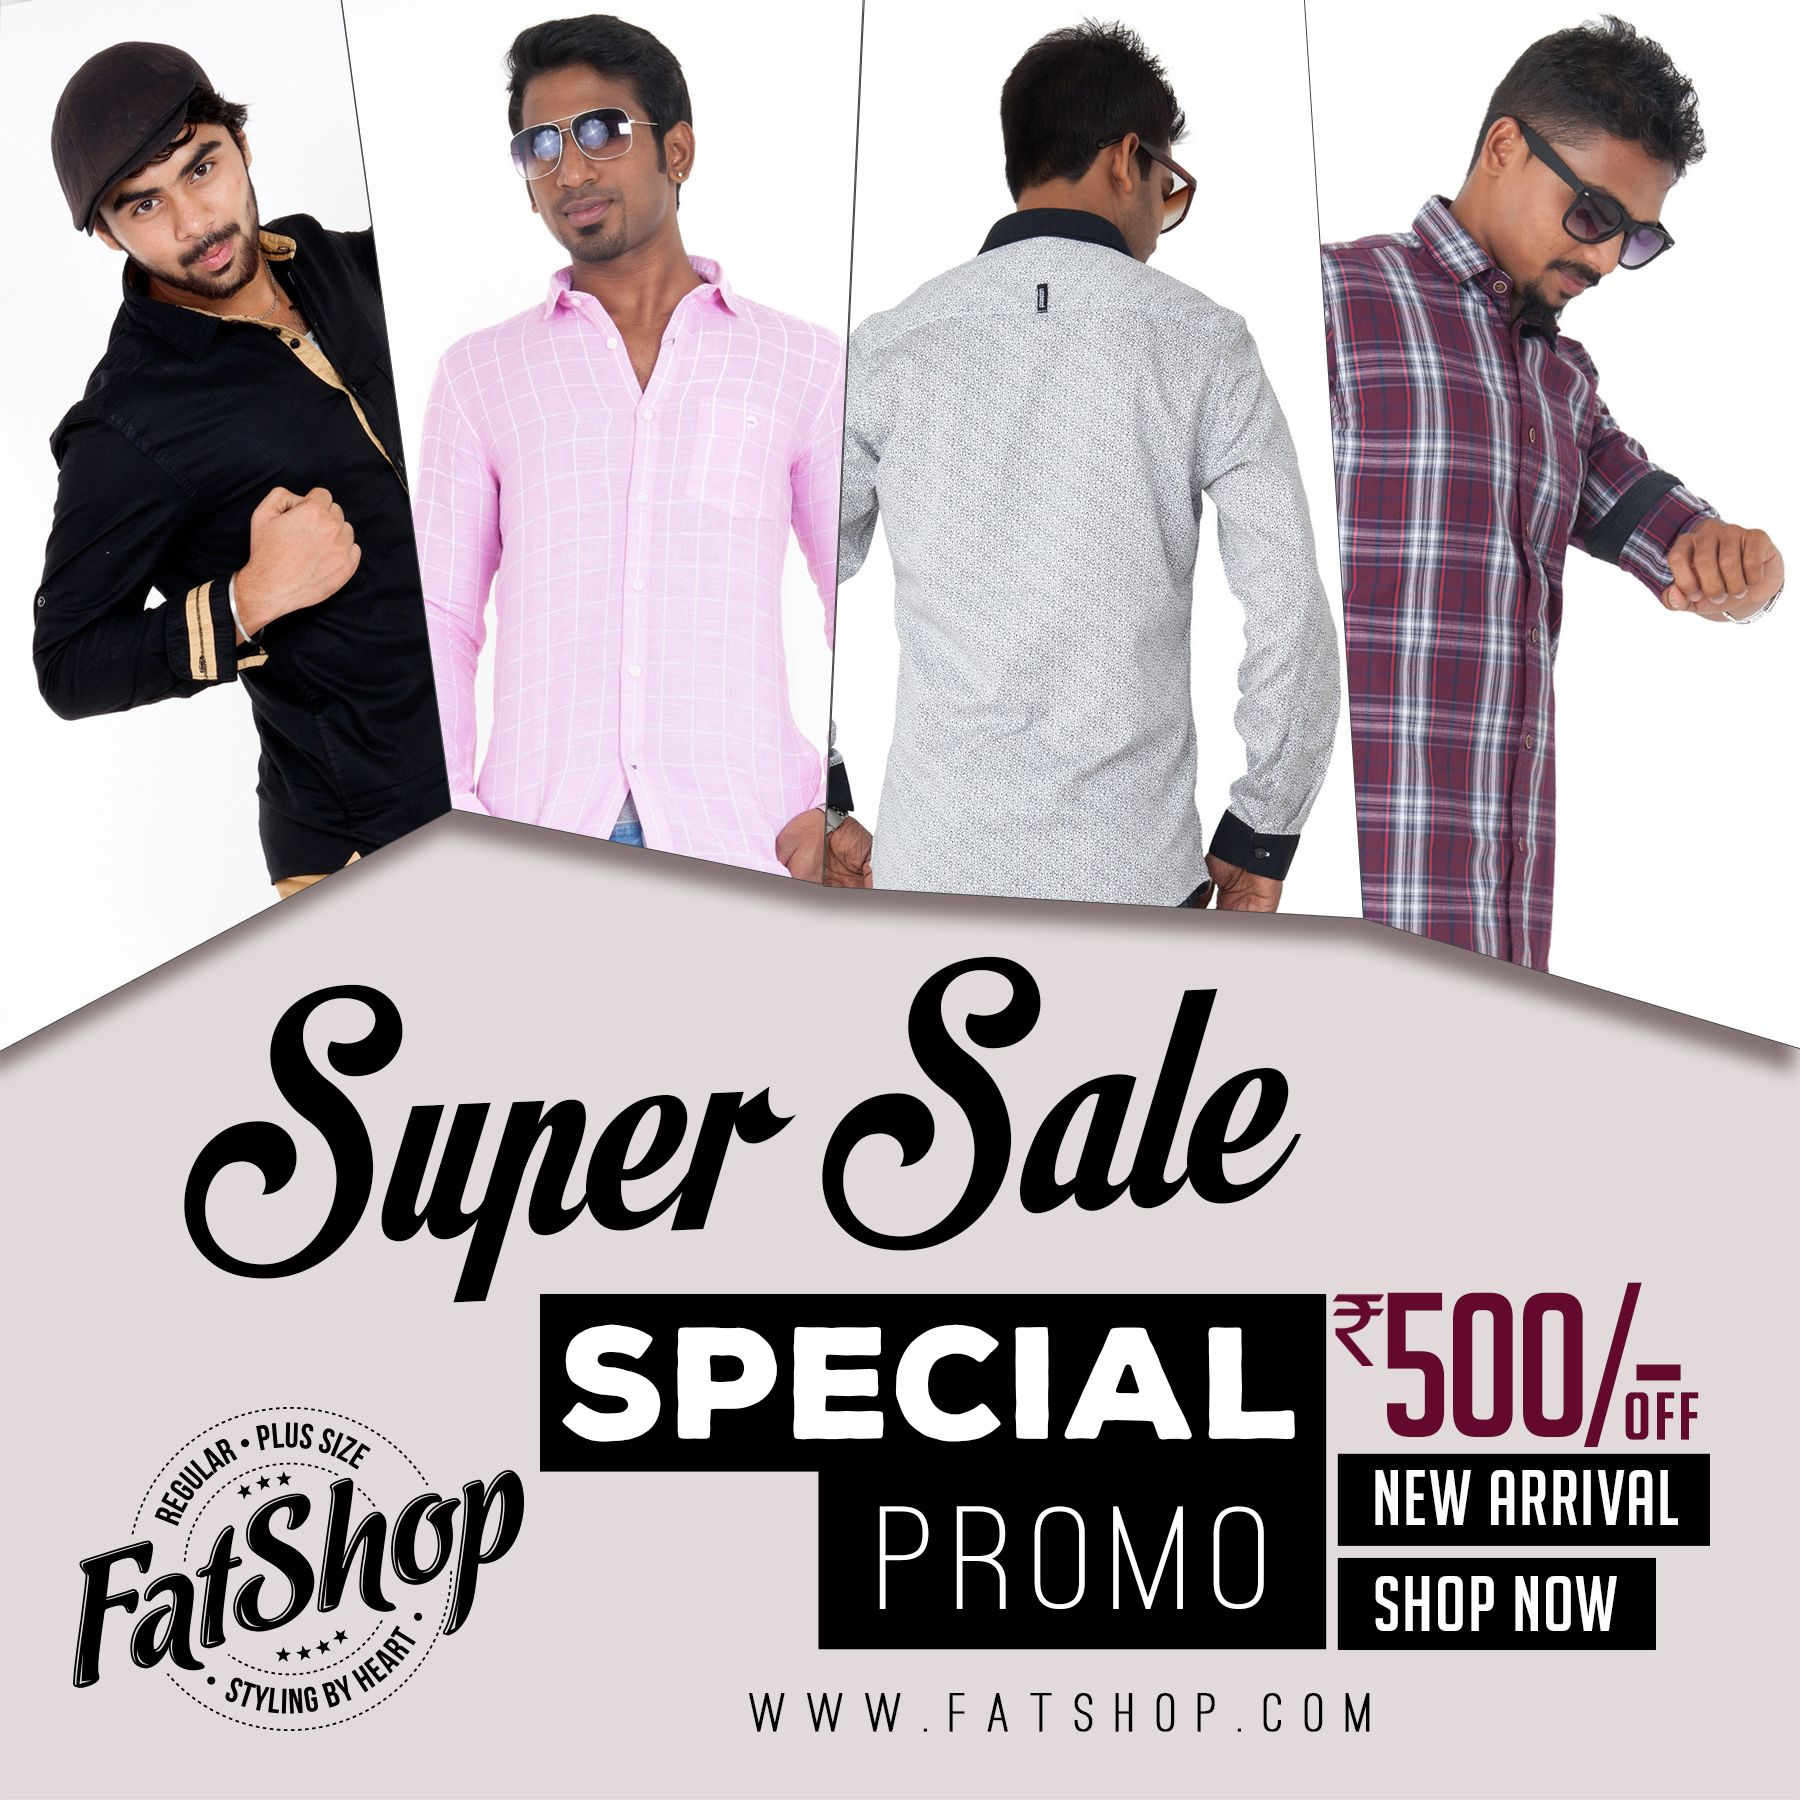 #OnlineFashionSale - Flat UP to 32% of on Men's apparel - Shop Now https://goo.gl/YF7Q1h Promo code - GET500.